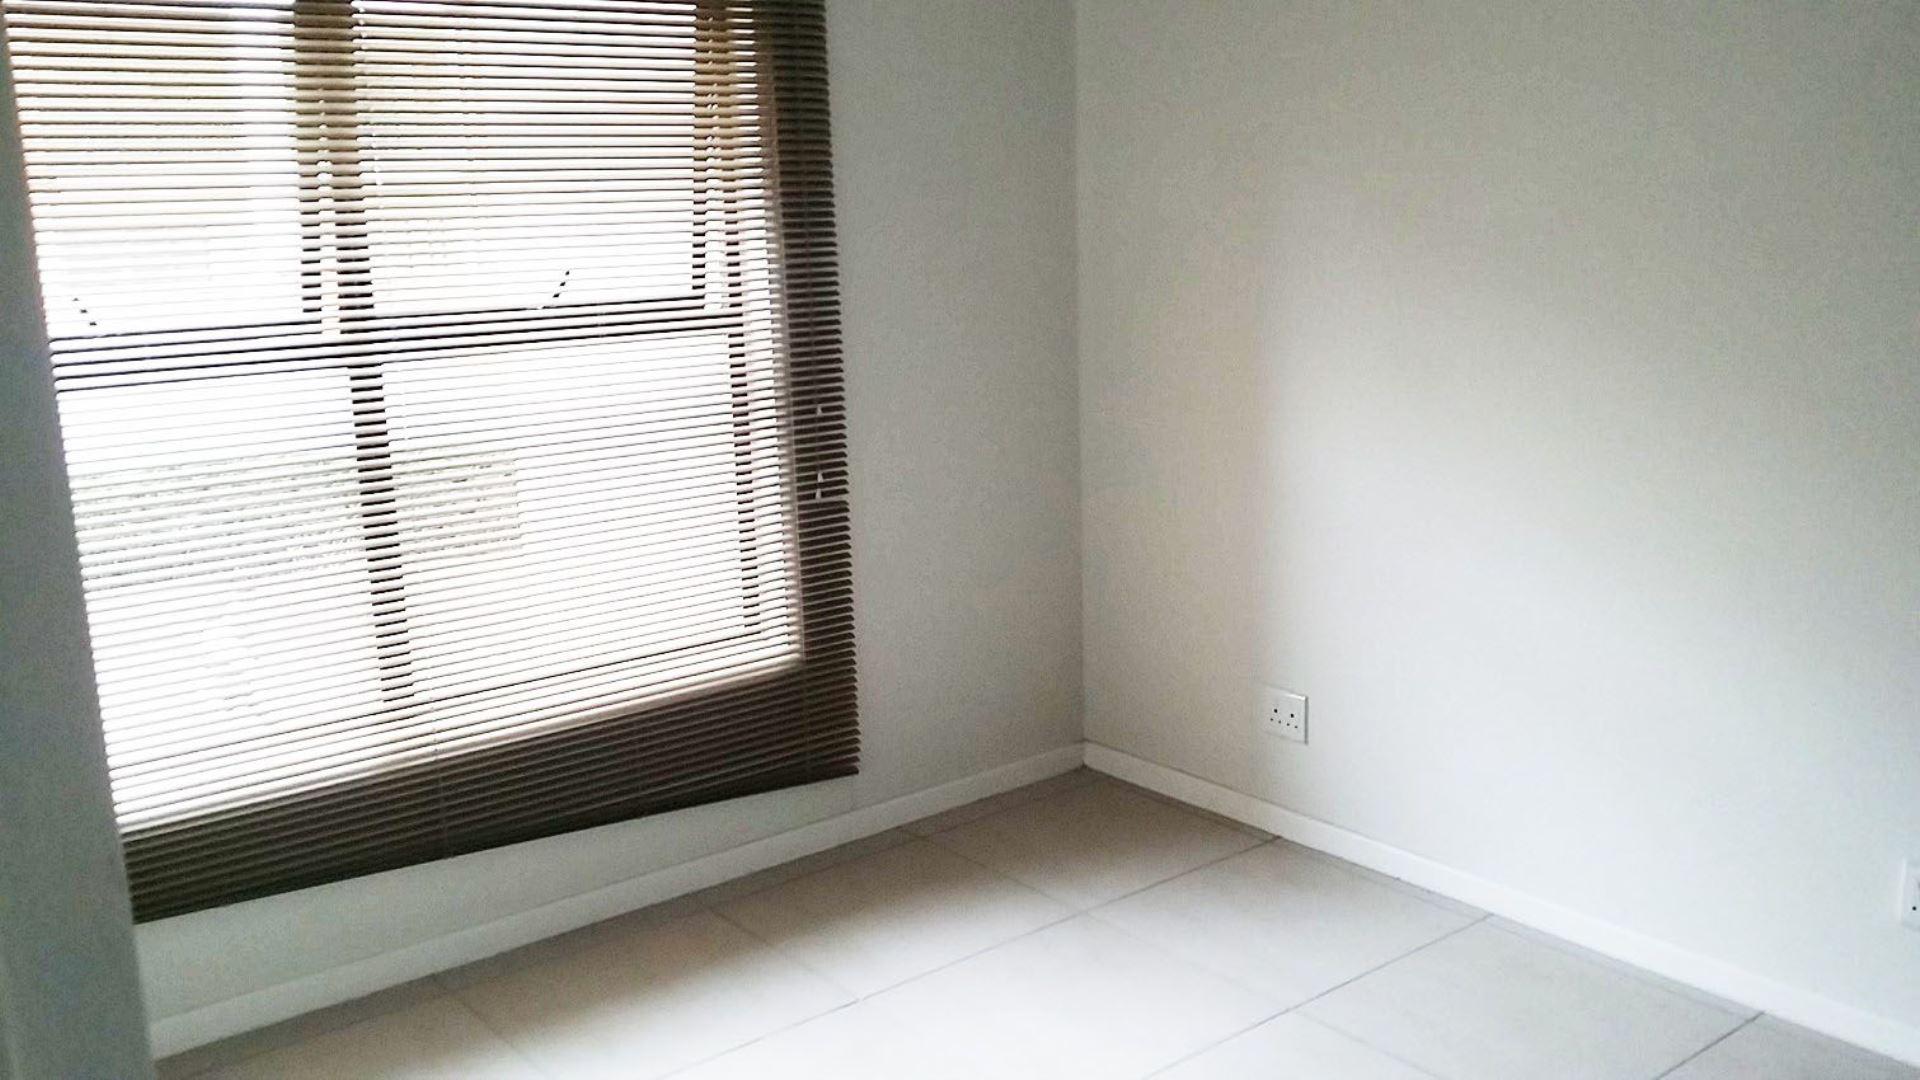 Apartment Rental Monthly in Kyalami AH